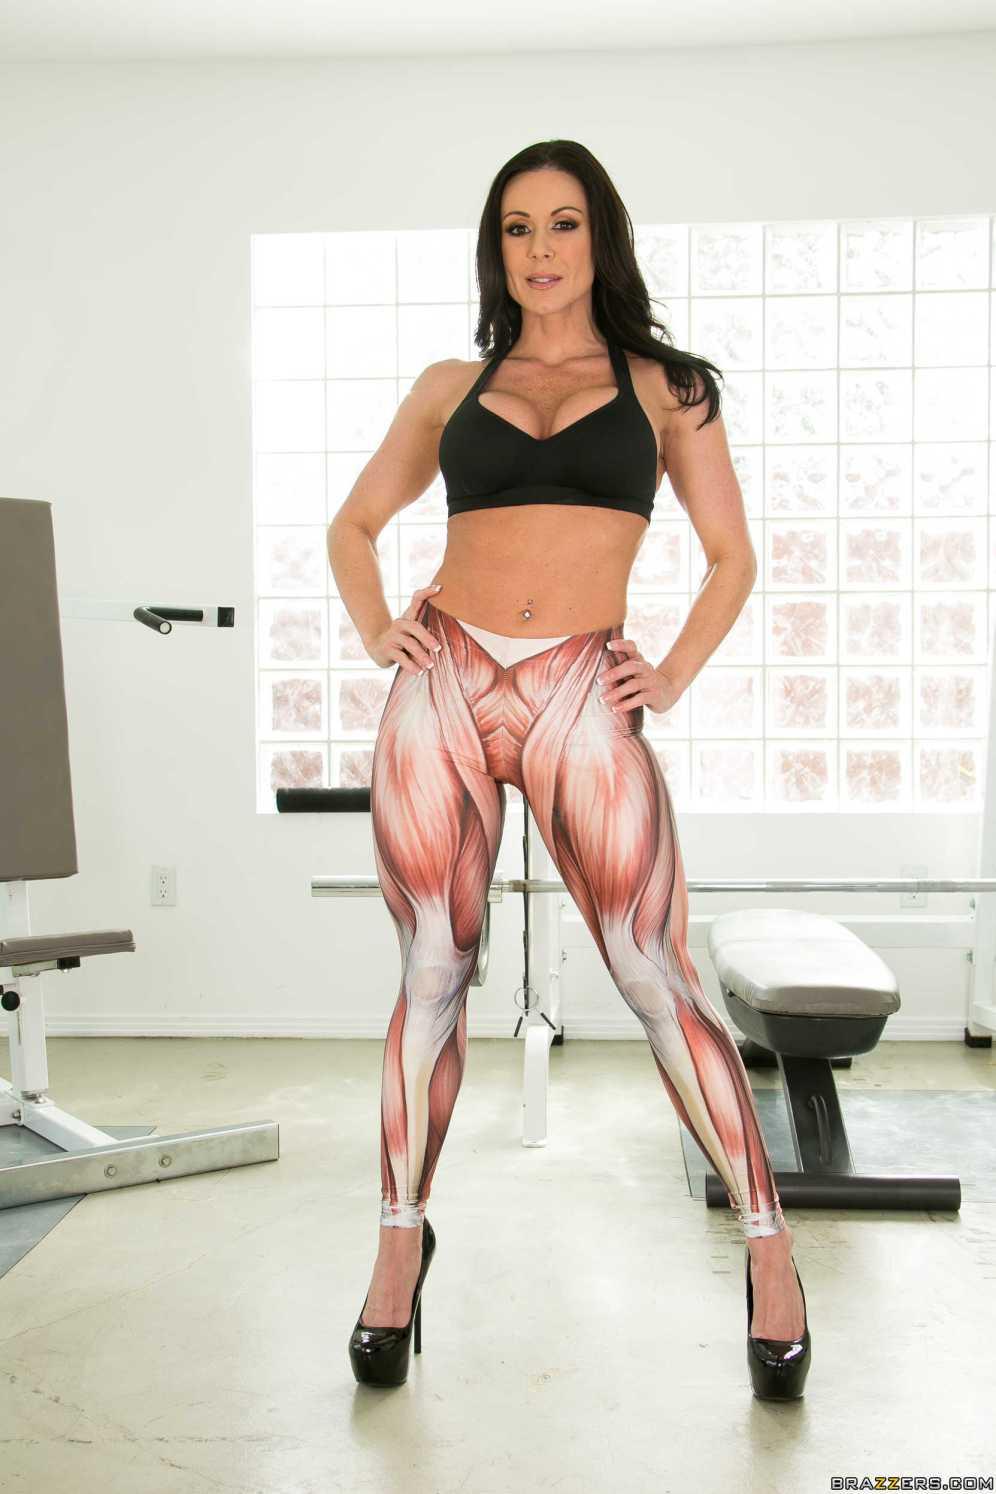 Kendra Lust gimnasio - Perfecta